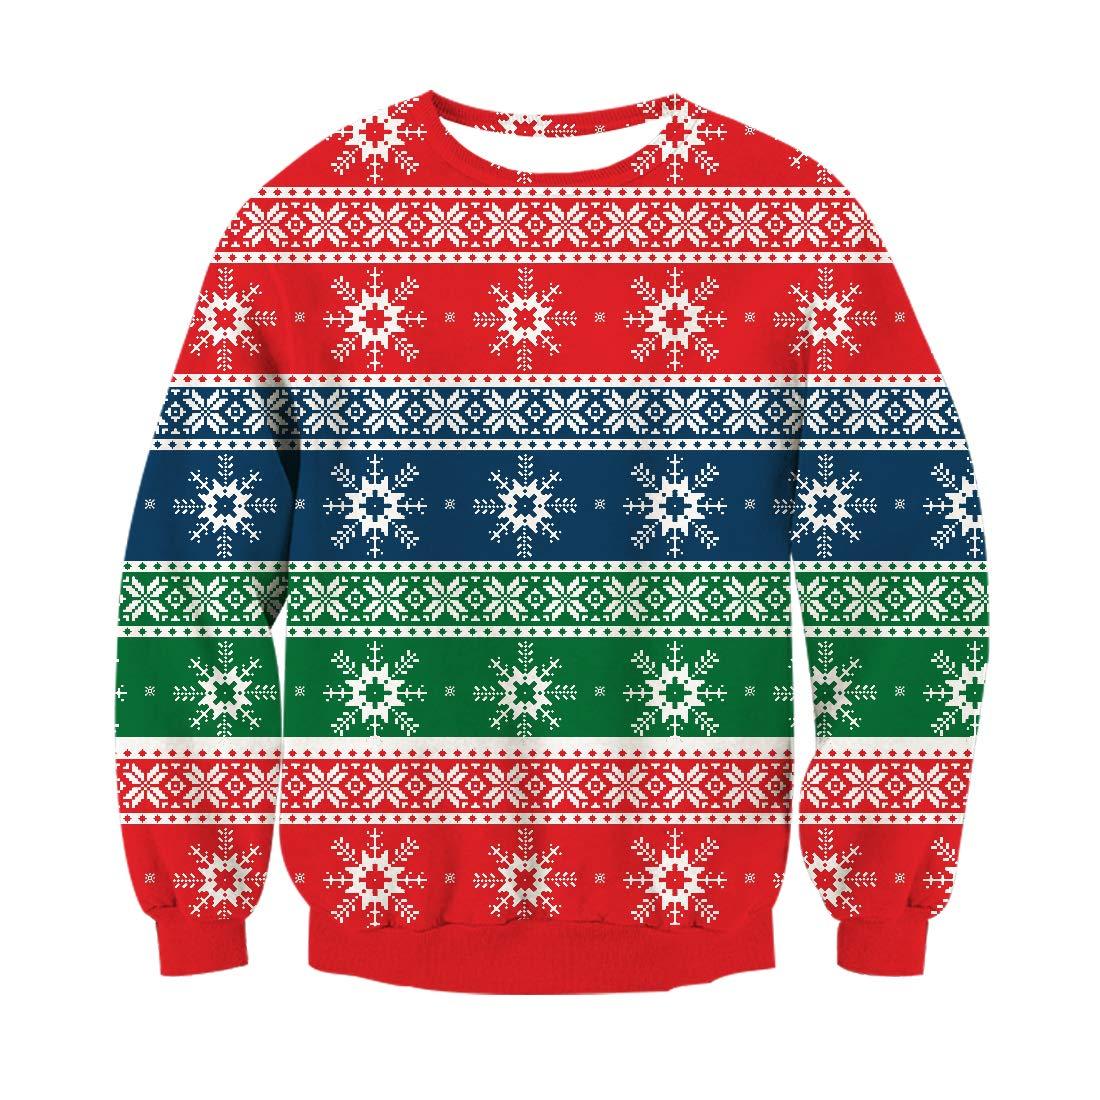 RAISEVERN Herren Damen Unisex Pullover Weihnachten Xmas Neuheit Retro Langarm Pullover Fairisle Sweater, Snowflake